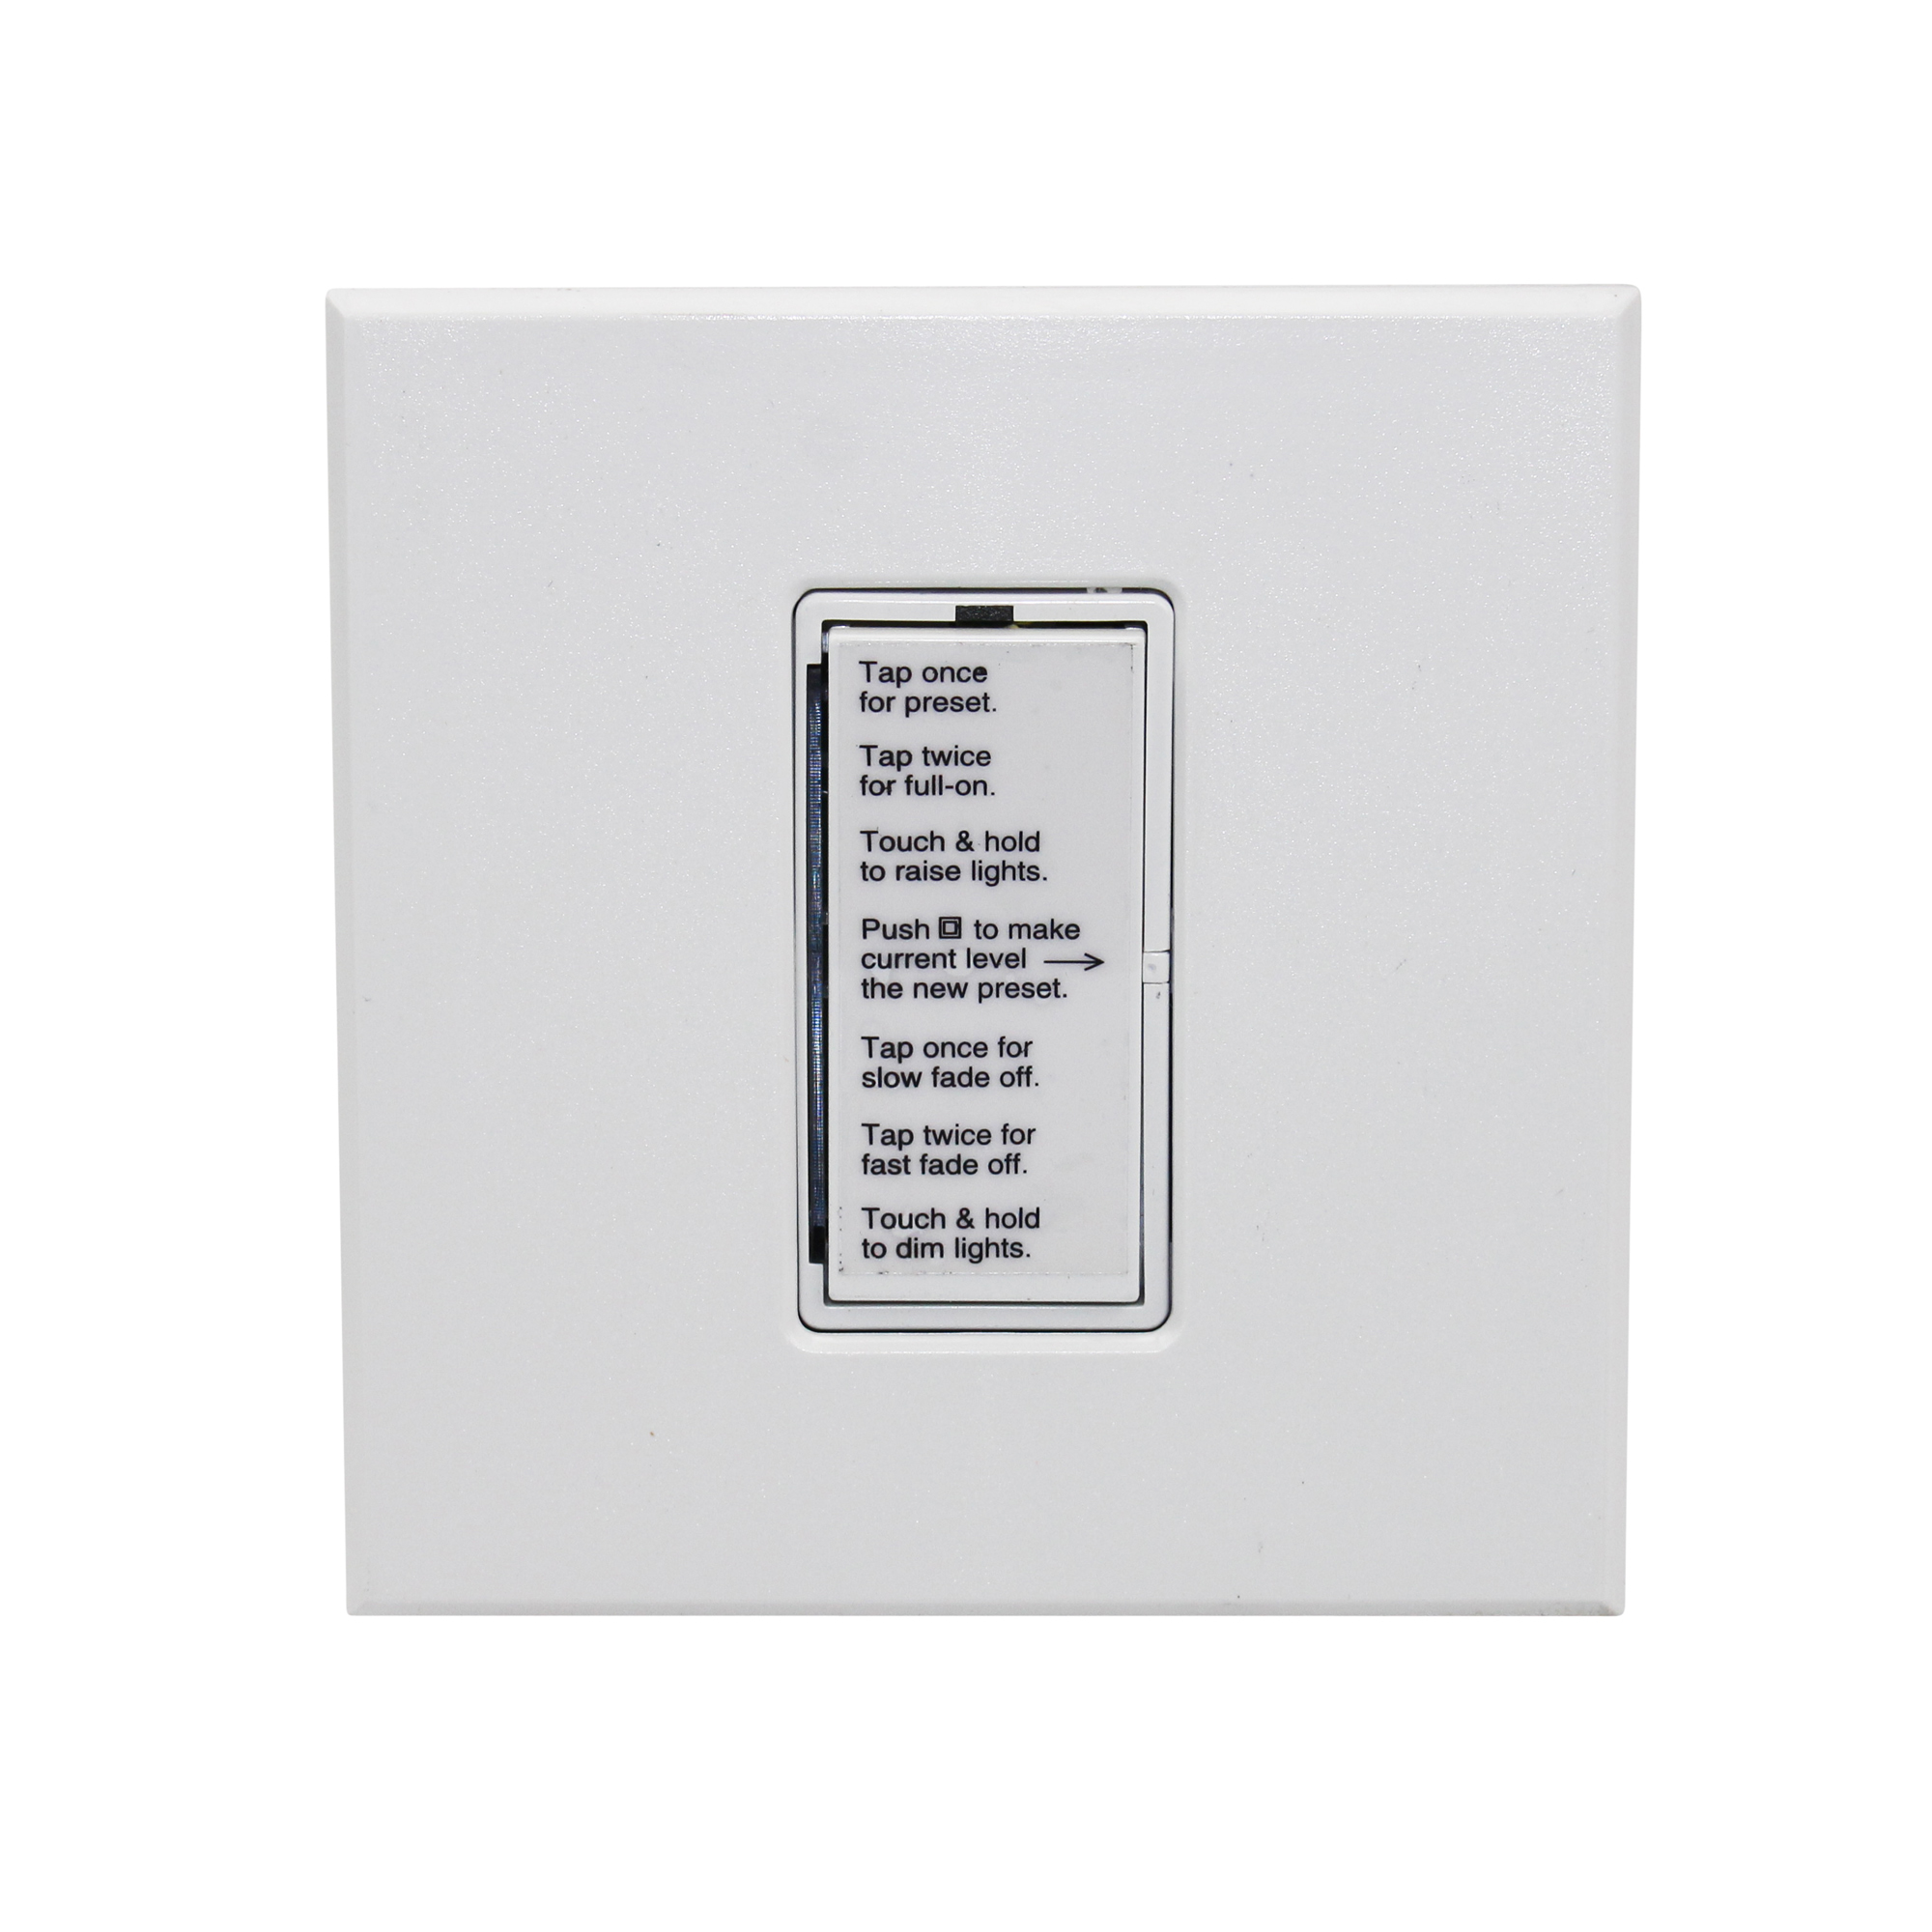 3 way dimmer switch with dimmer wiring diagram lightolier oh1500va-w onset digital dimmer, decora, 500va ... lightolier onset dimmer wiring diagram